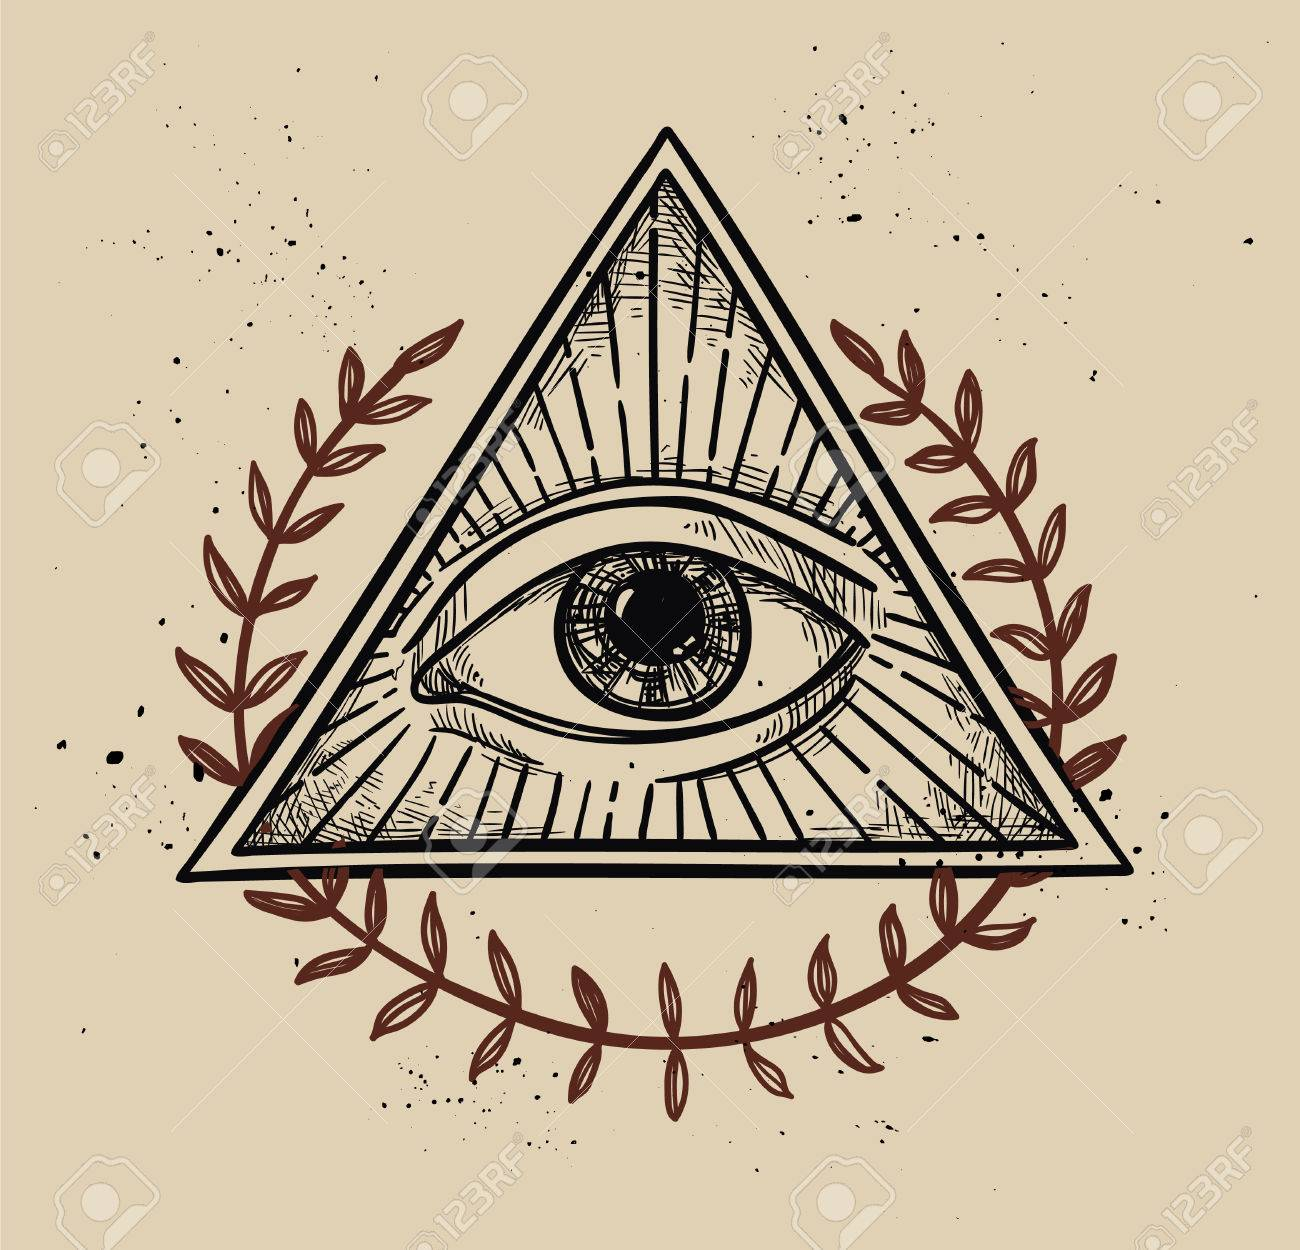 0a7d7fe1fd31f Hand drawn vector illustration - All seeing eye pyramid symbol. Freemason  and spiritual. Vintage